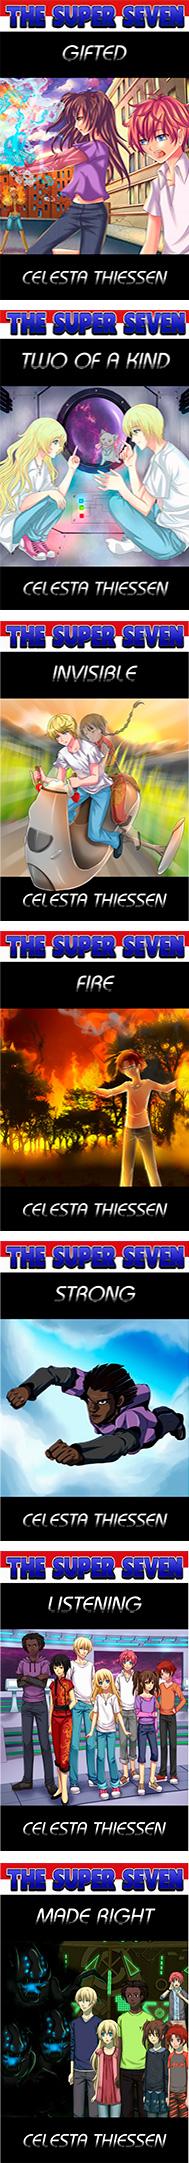 Mid-school science fiction Super Seven series